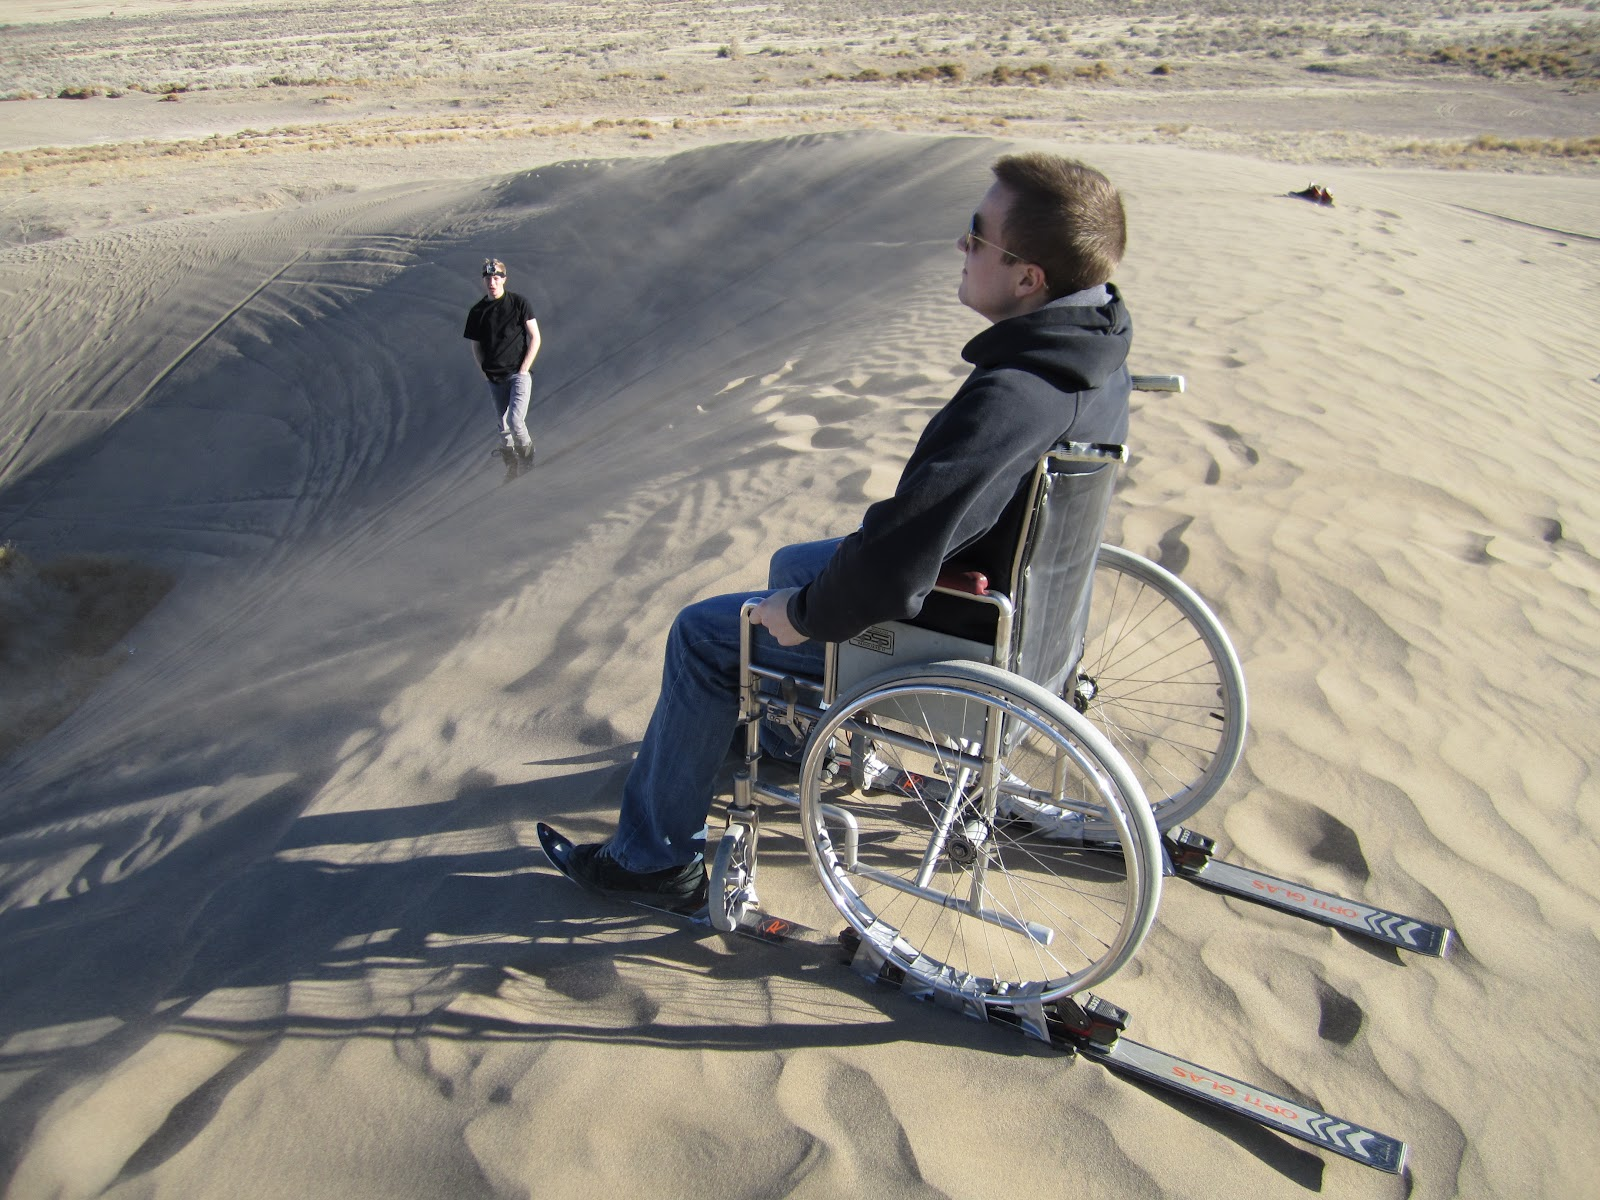 Wheelchair Skiing Steel Chair Base Price Canyon 39s Adventure Craze Sandboarding The Oak City Sand Dunes